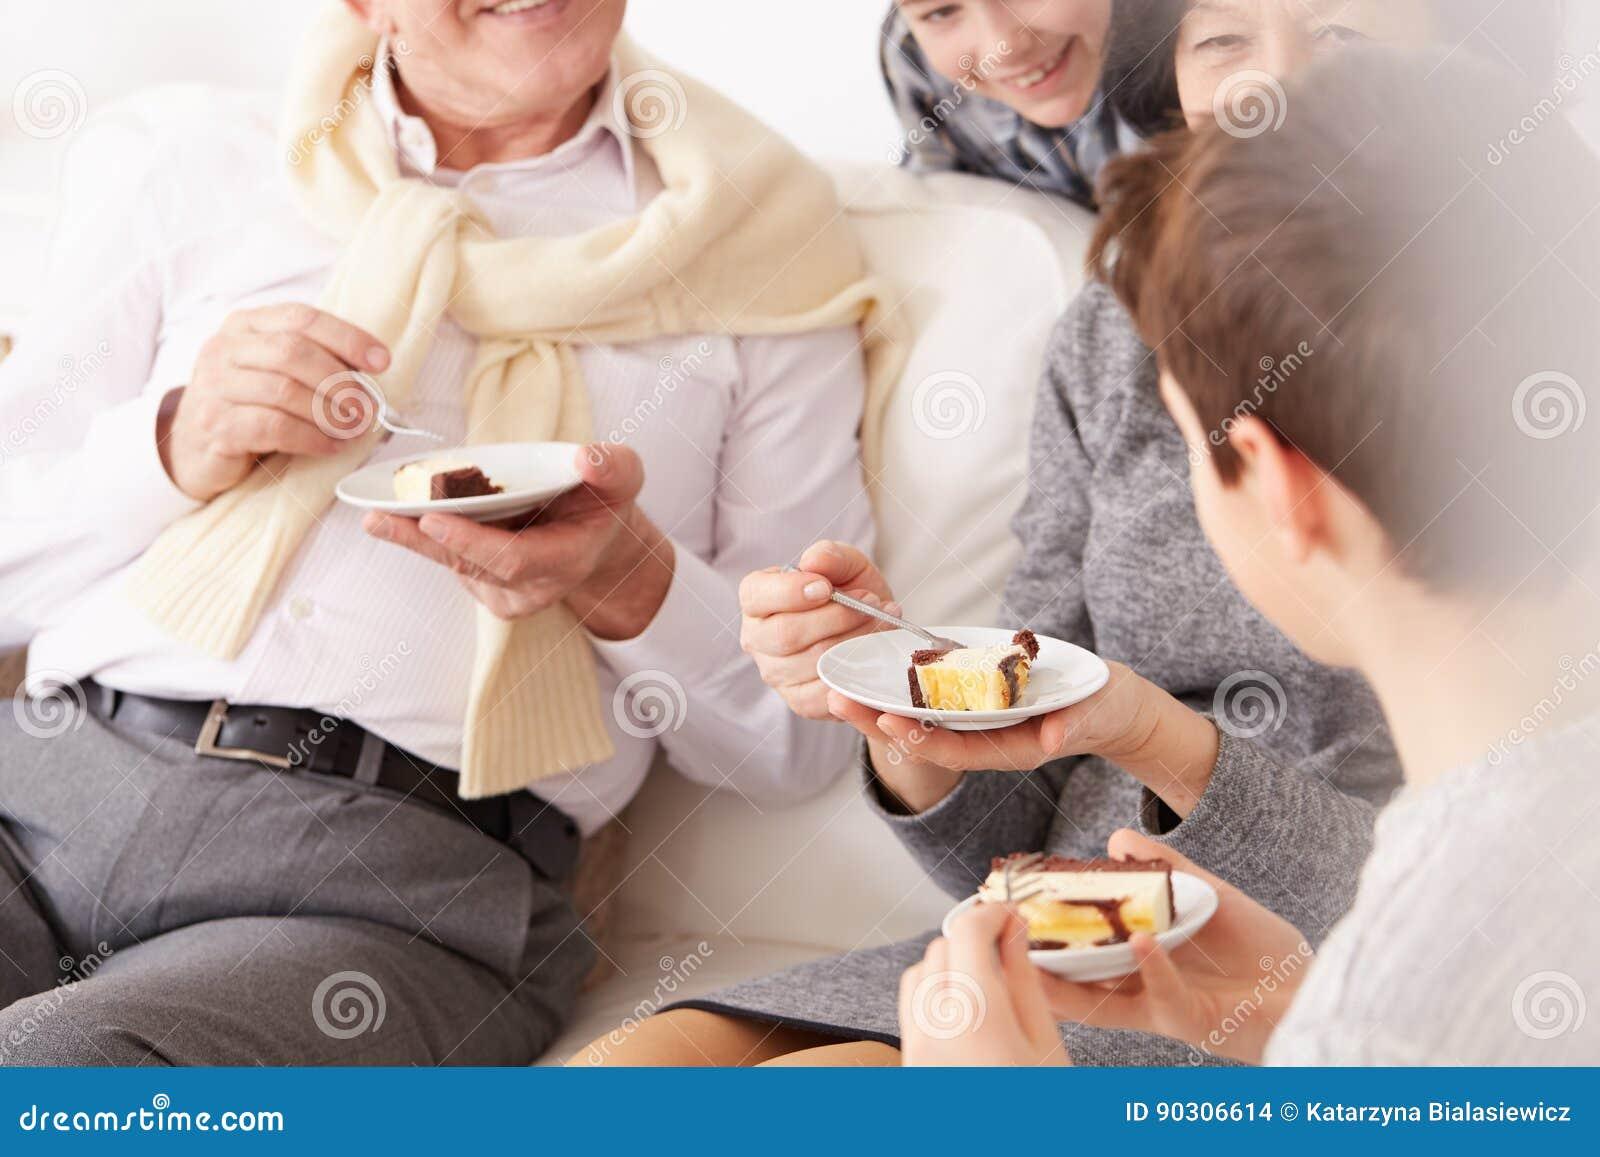 Grandparents and grandchildren eating a cake